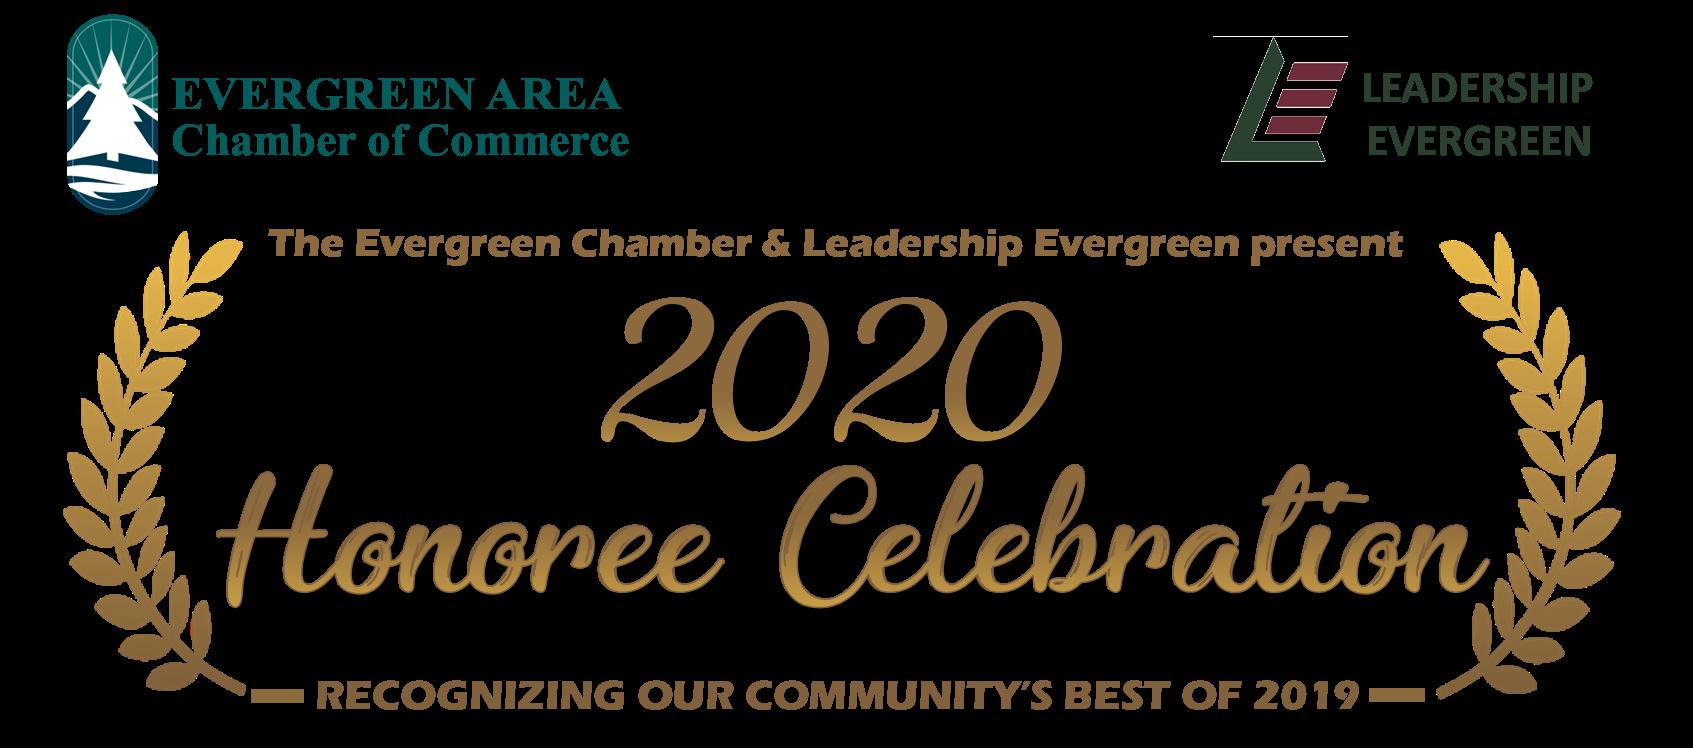 2020 Honoree Celebration